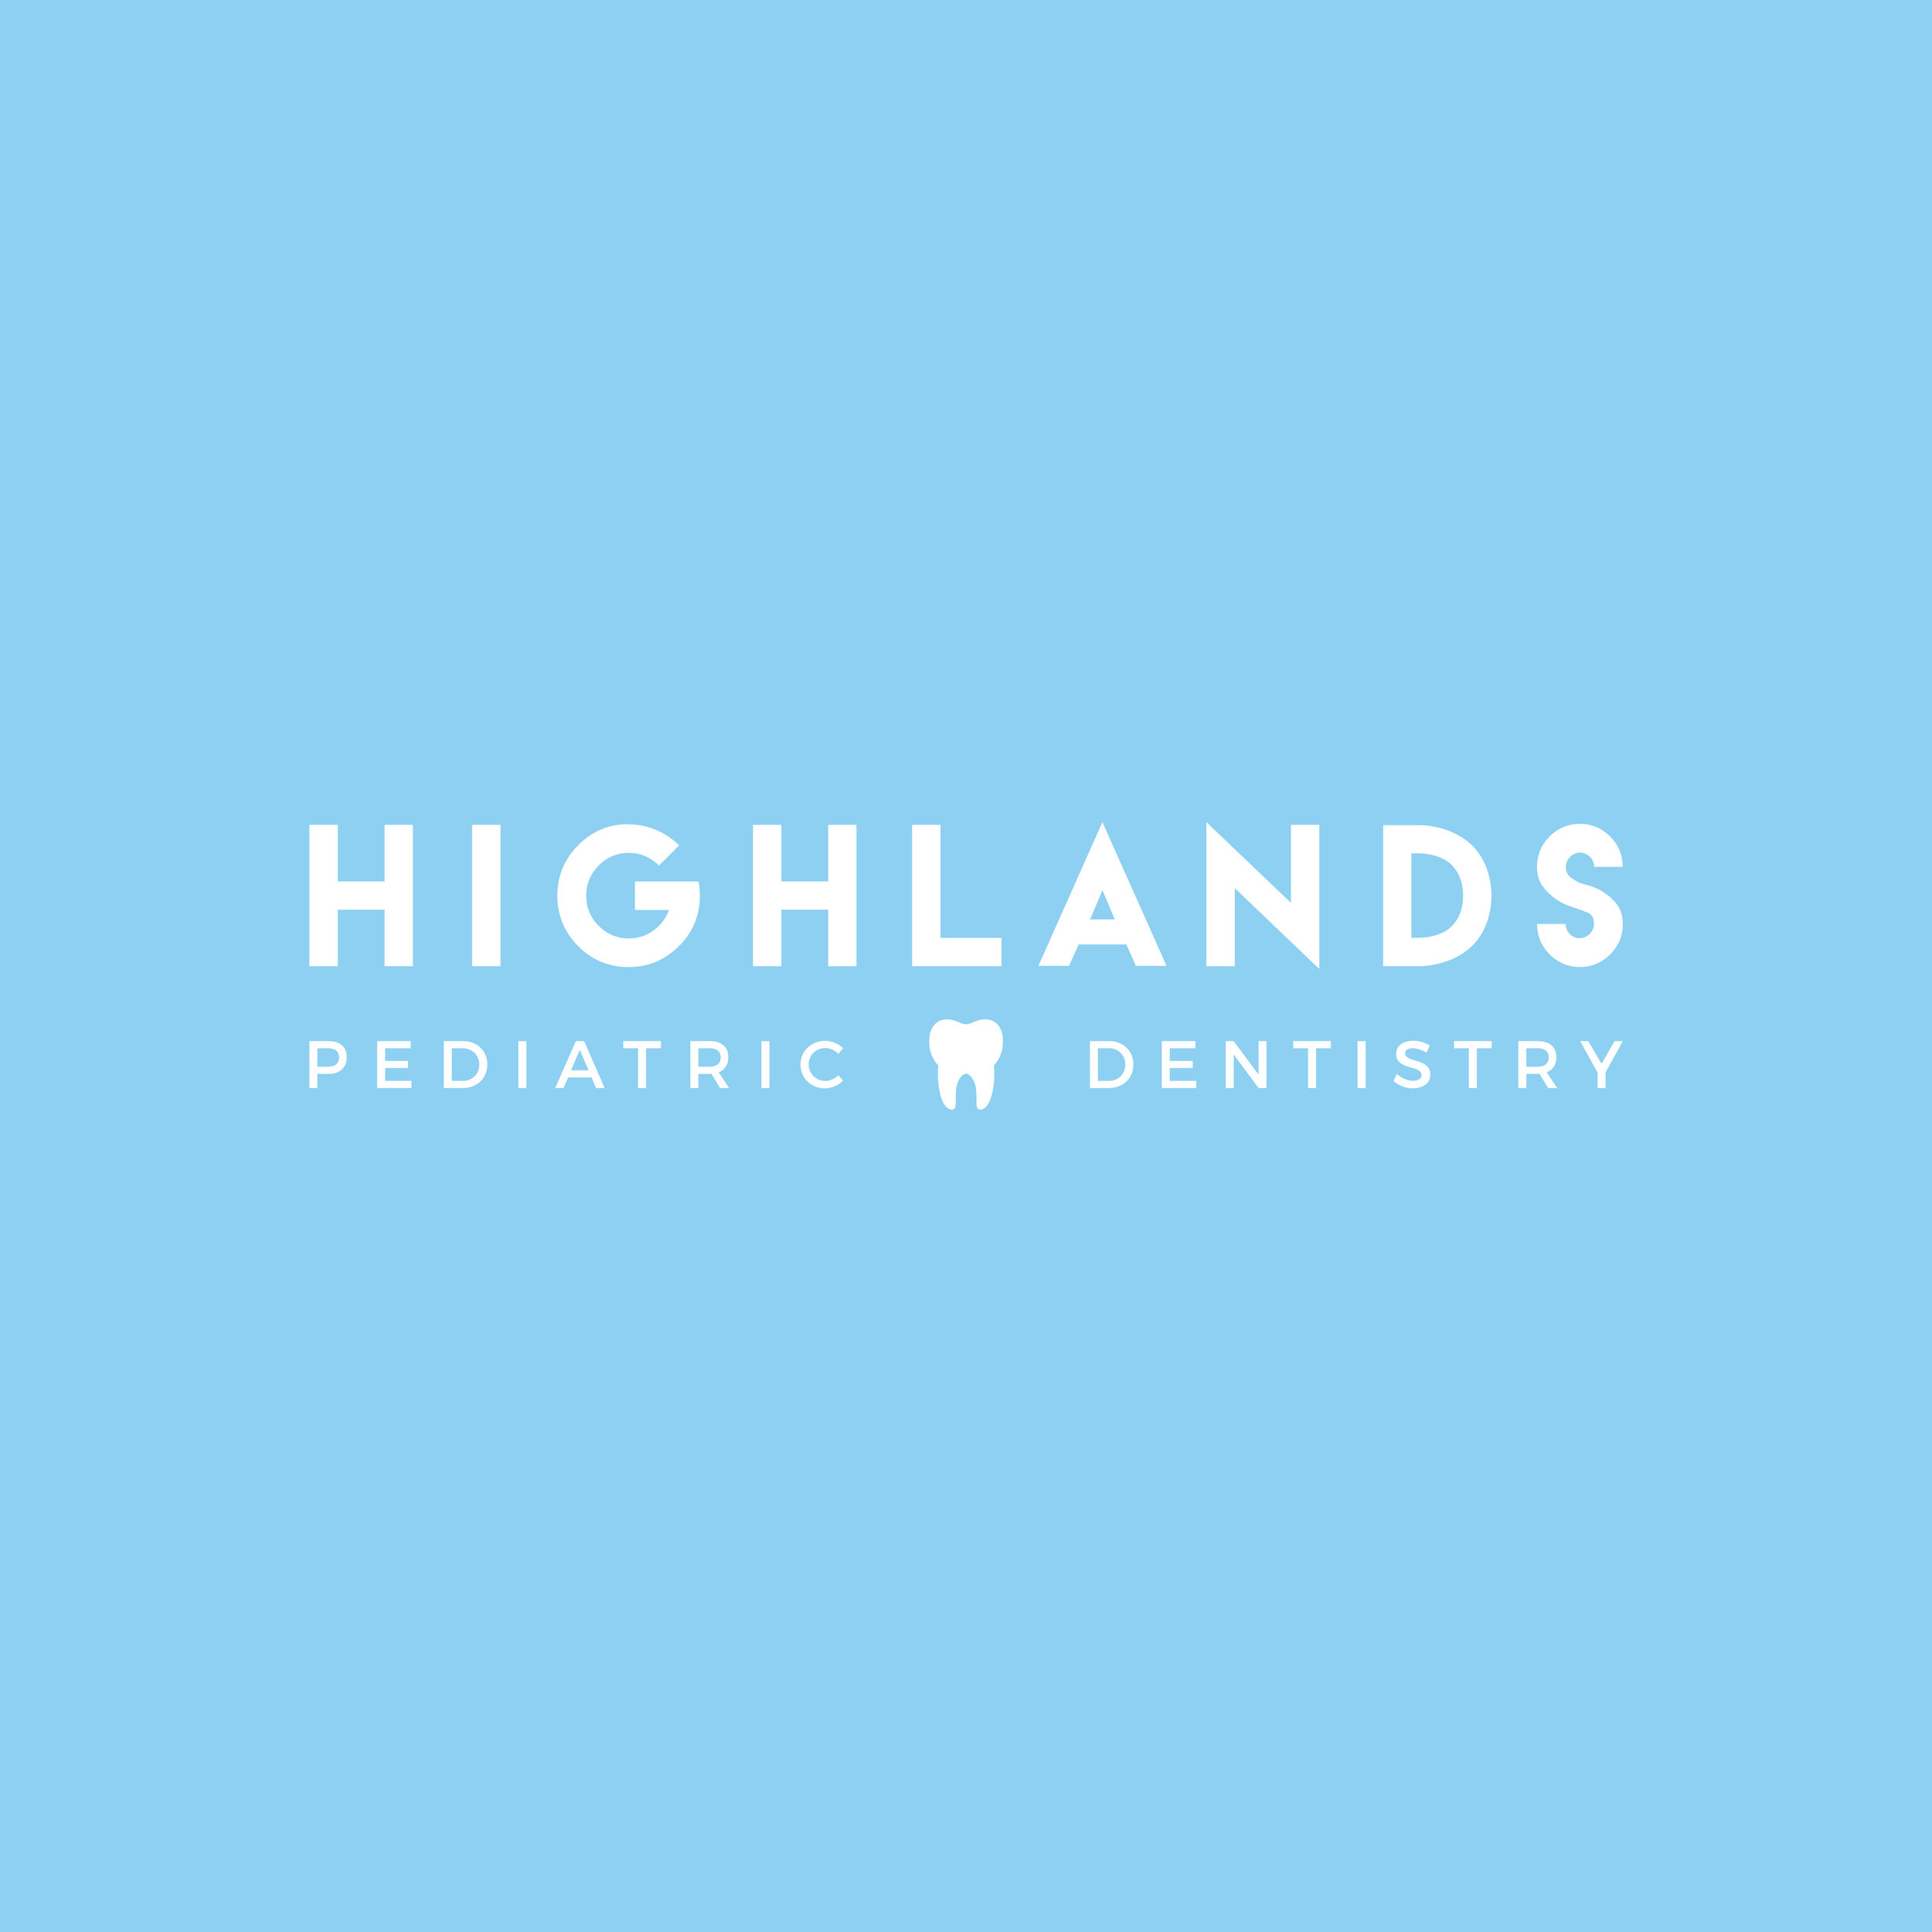 Highlands-02.jpg